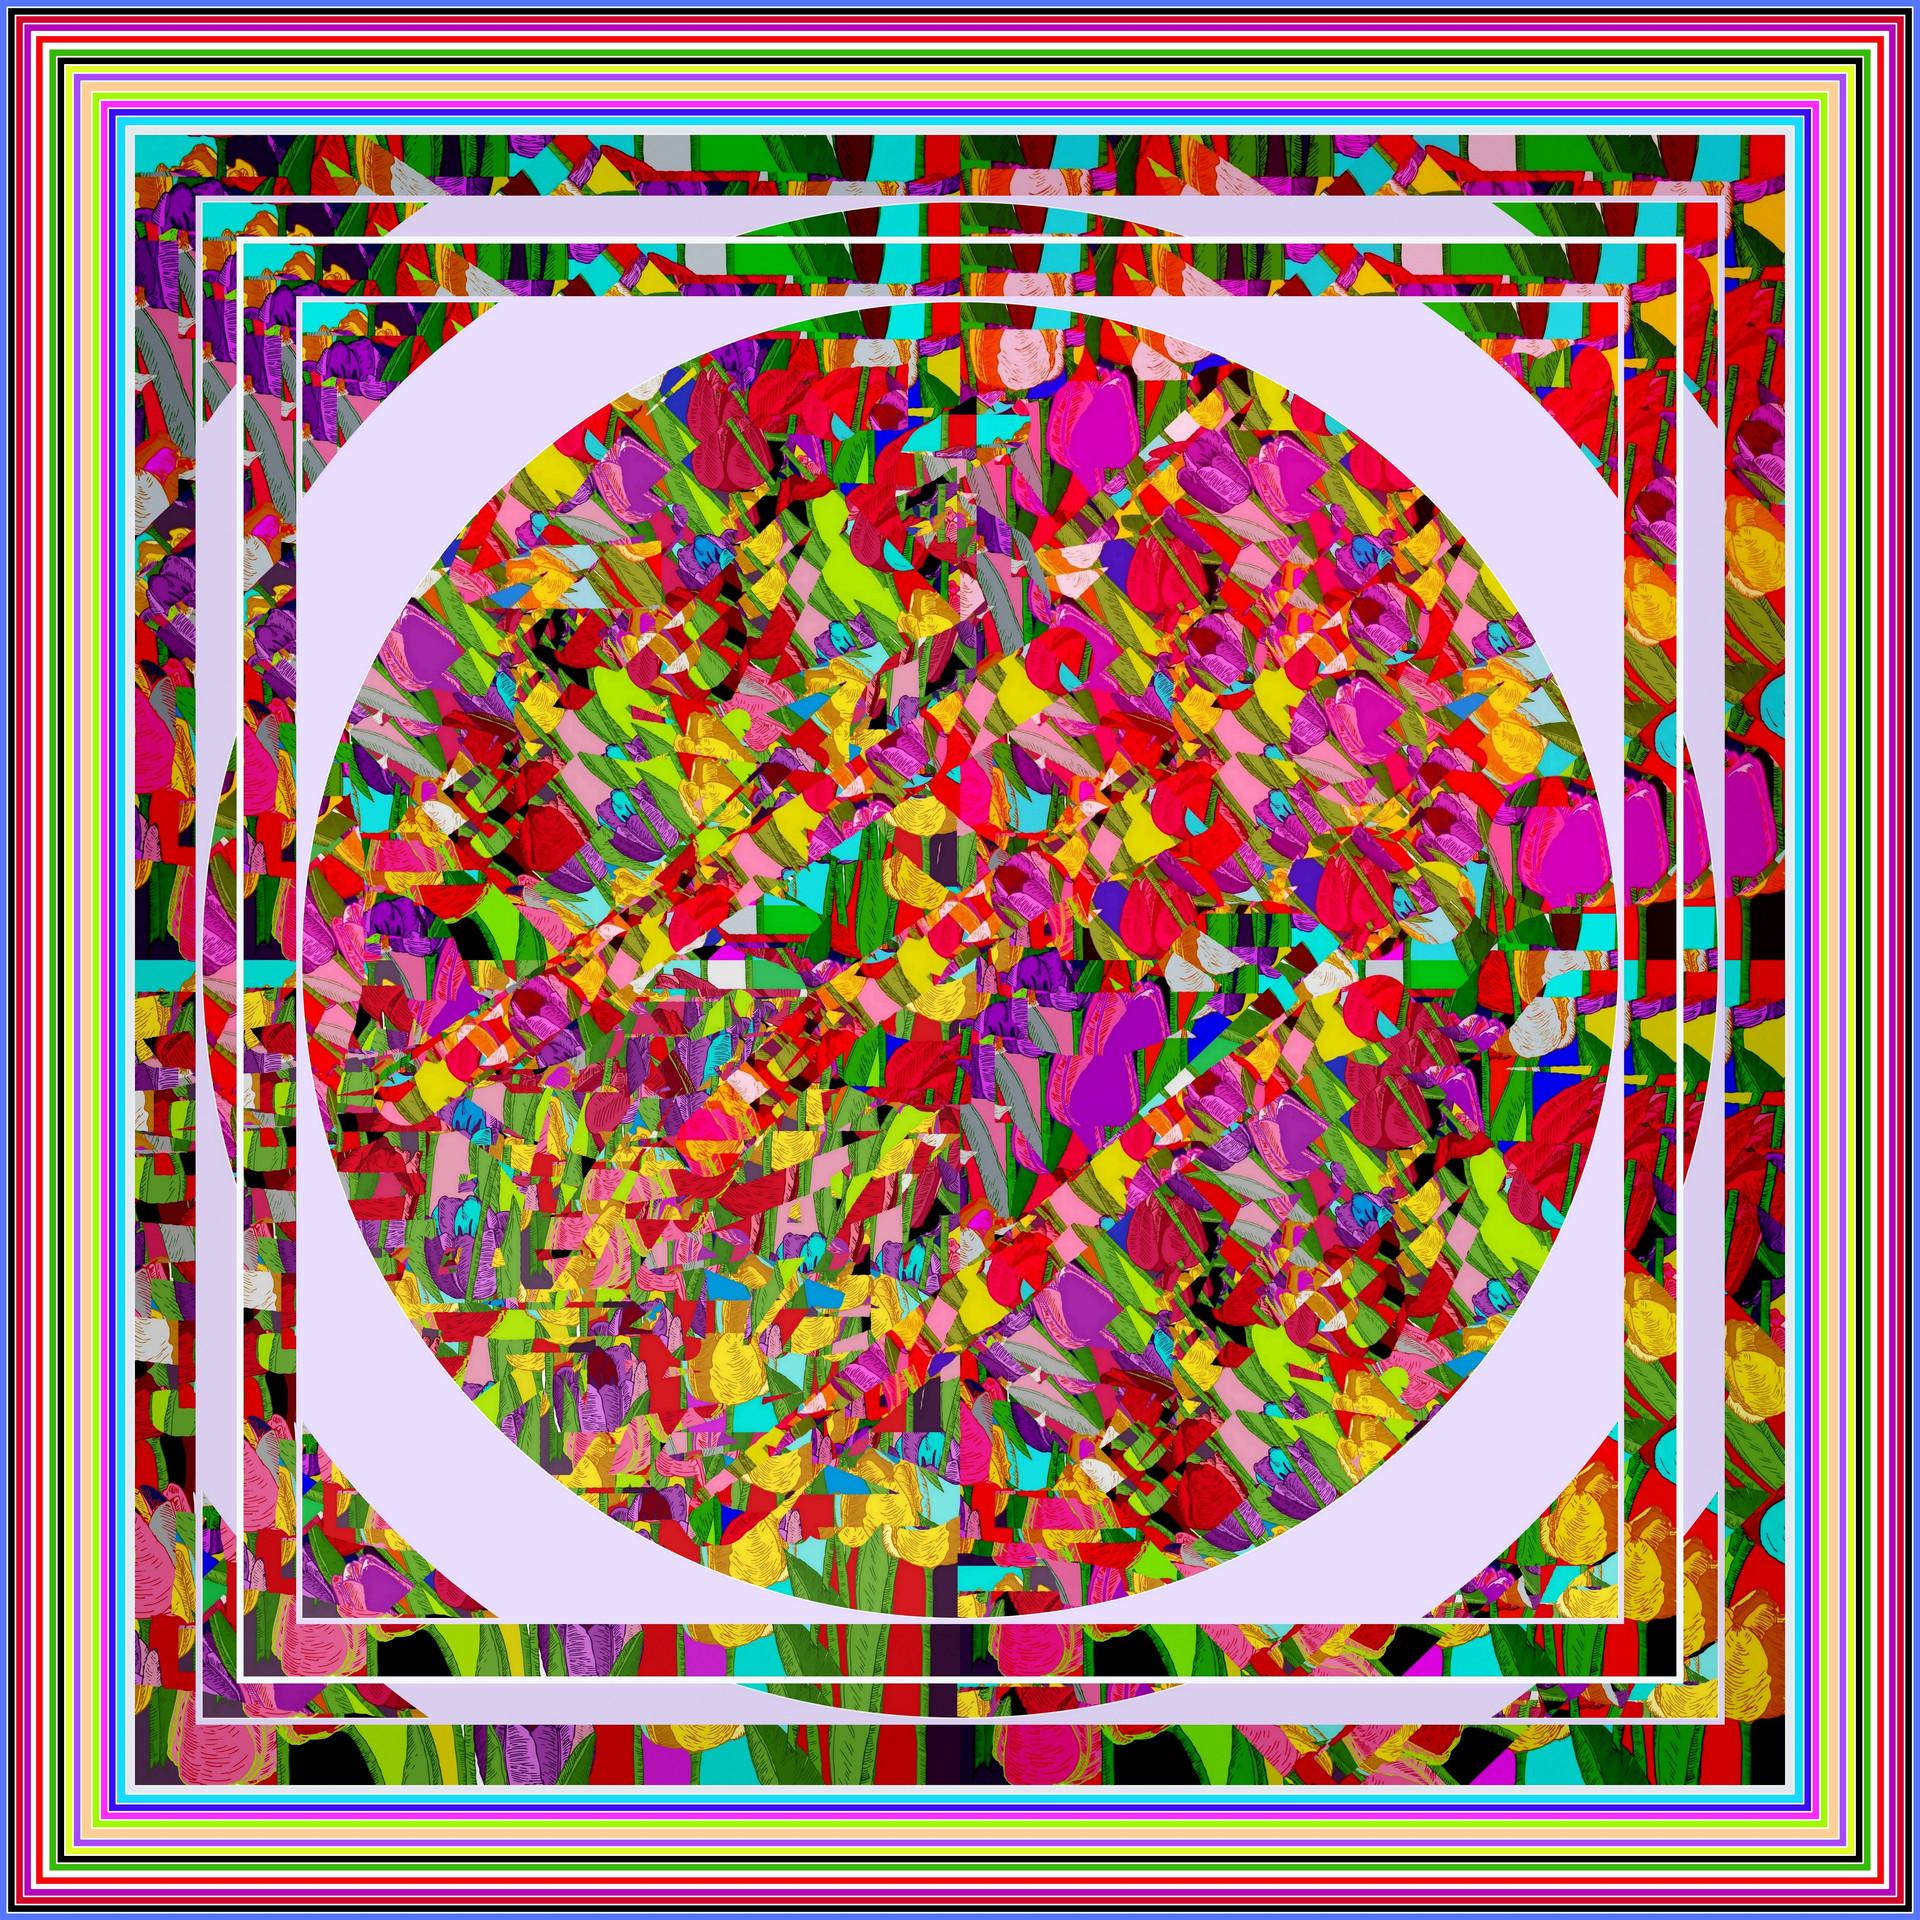 1-Collage5.jpg